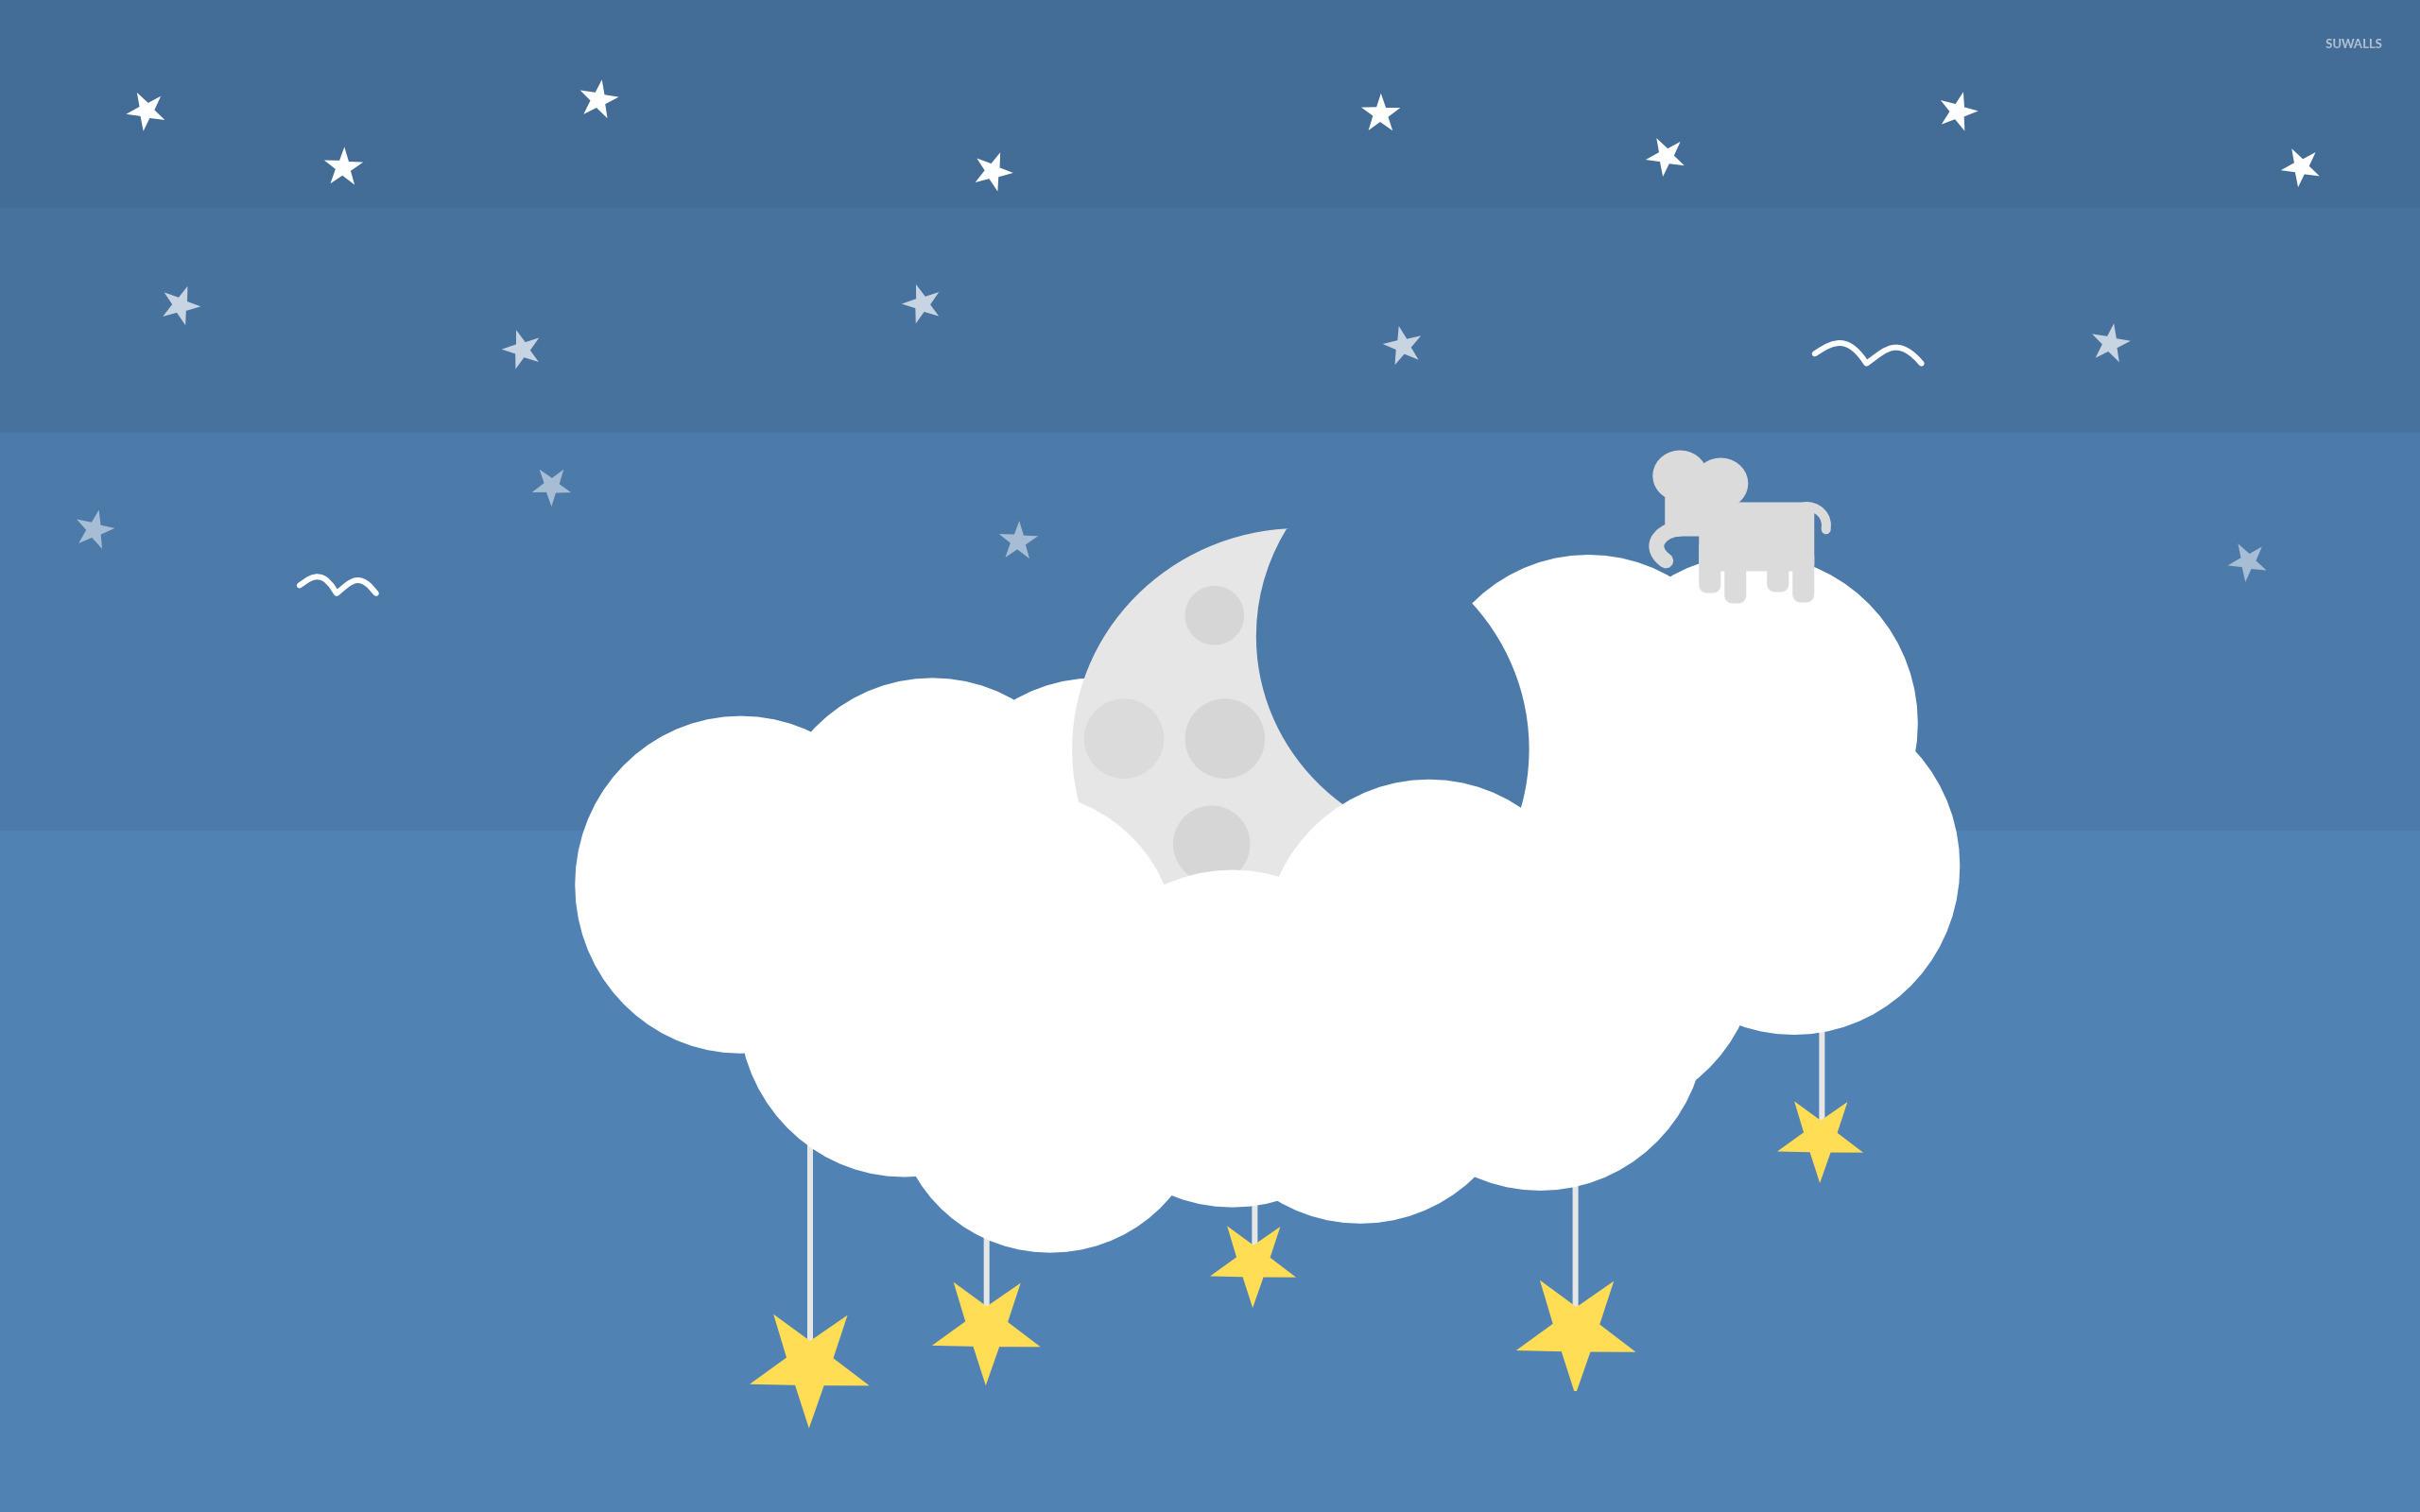 Fall Ceiling Wallpaper Download Sweet Dreams Wallpaper Vector Wallpapers 14407